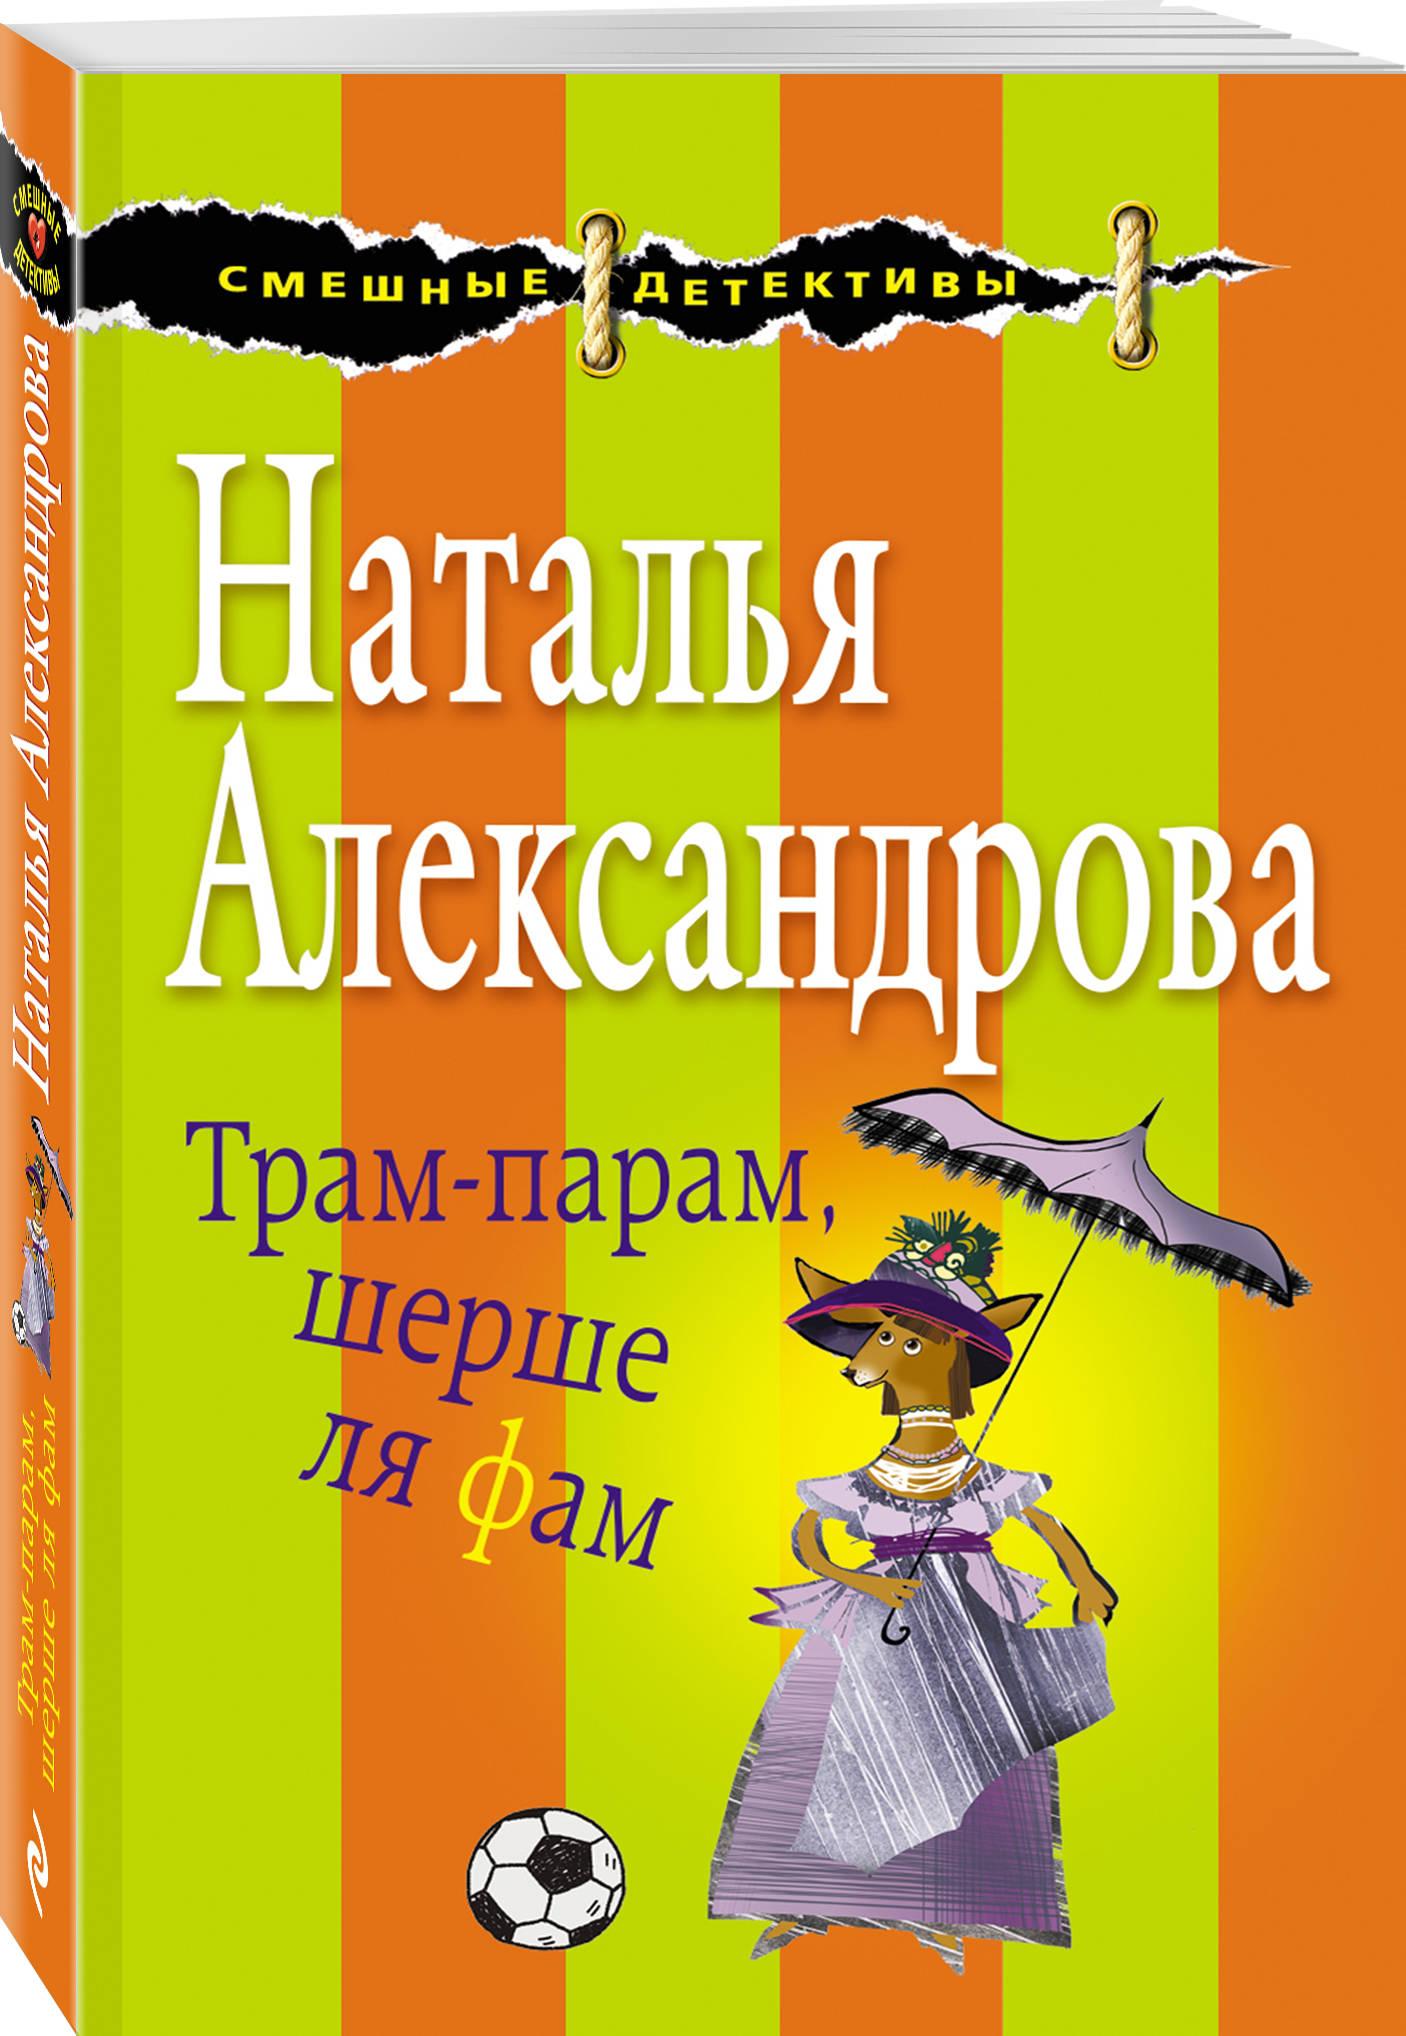 Александрова Н.Н. Трам-парам, шерше ля фам